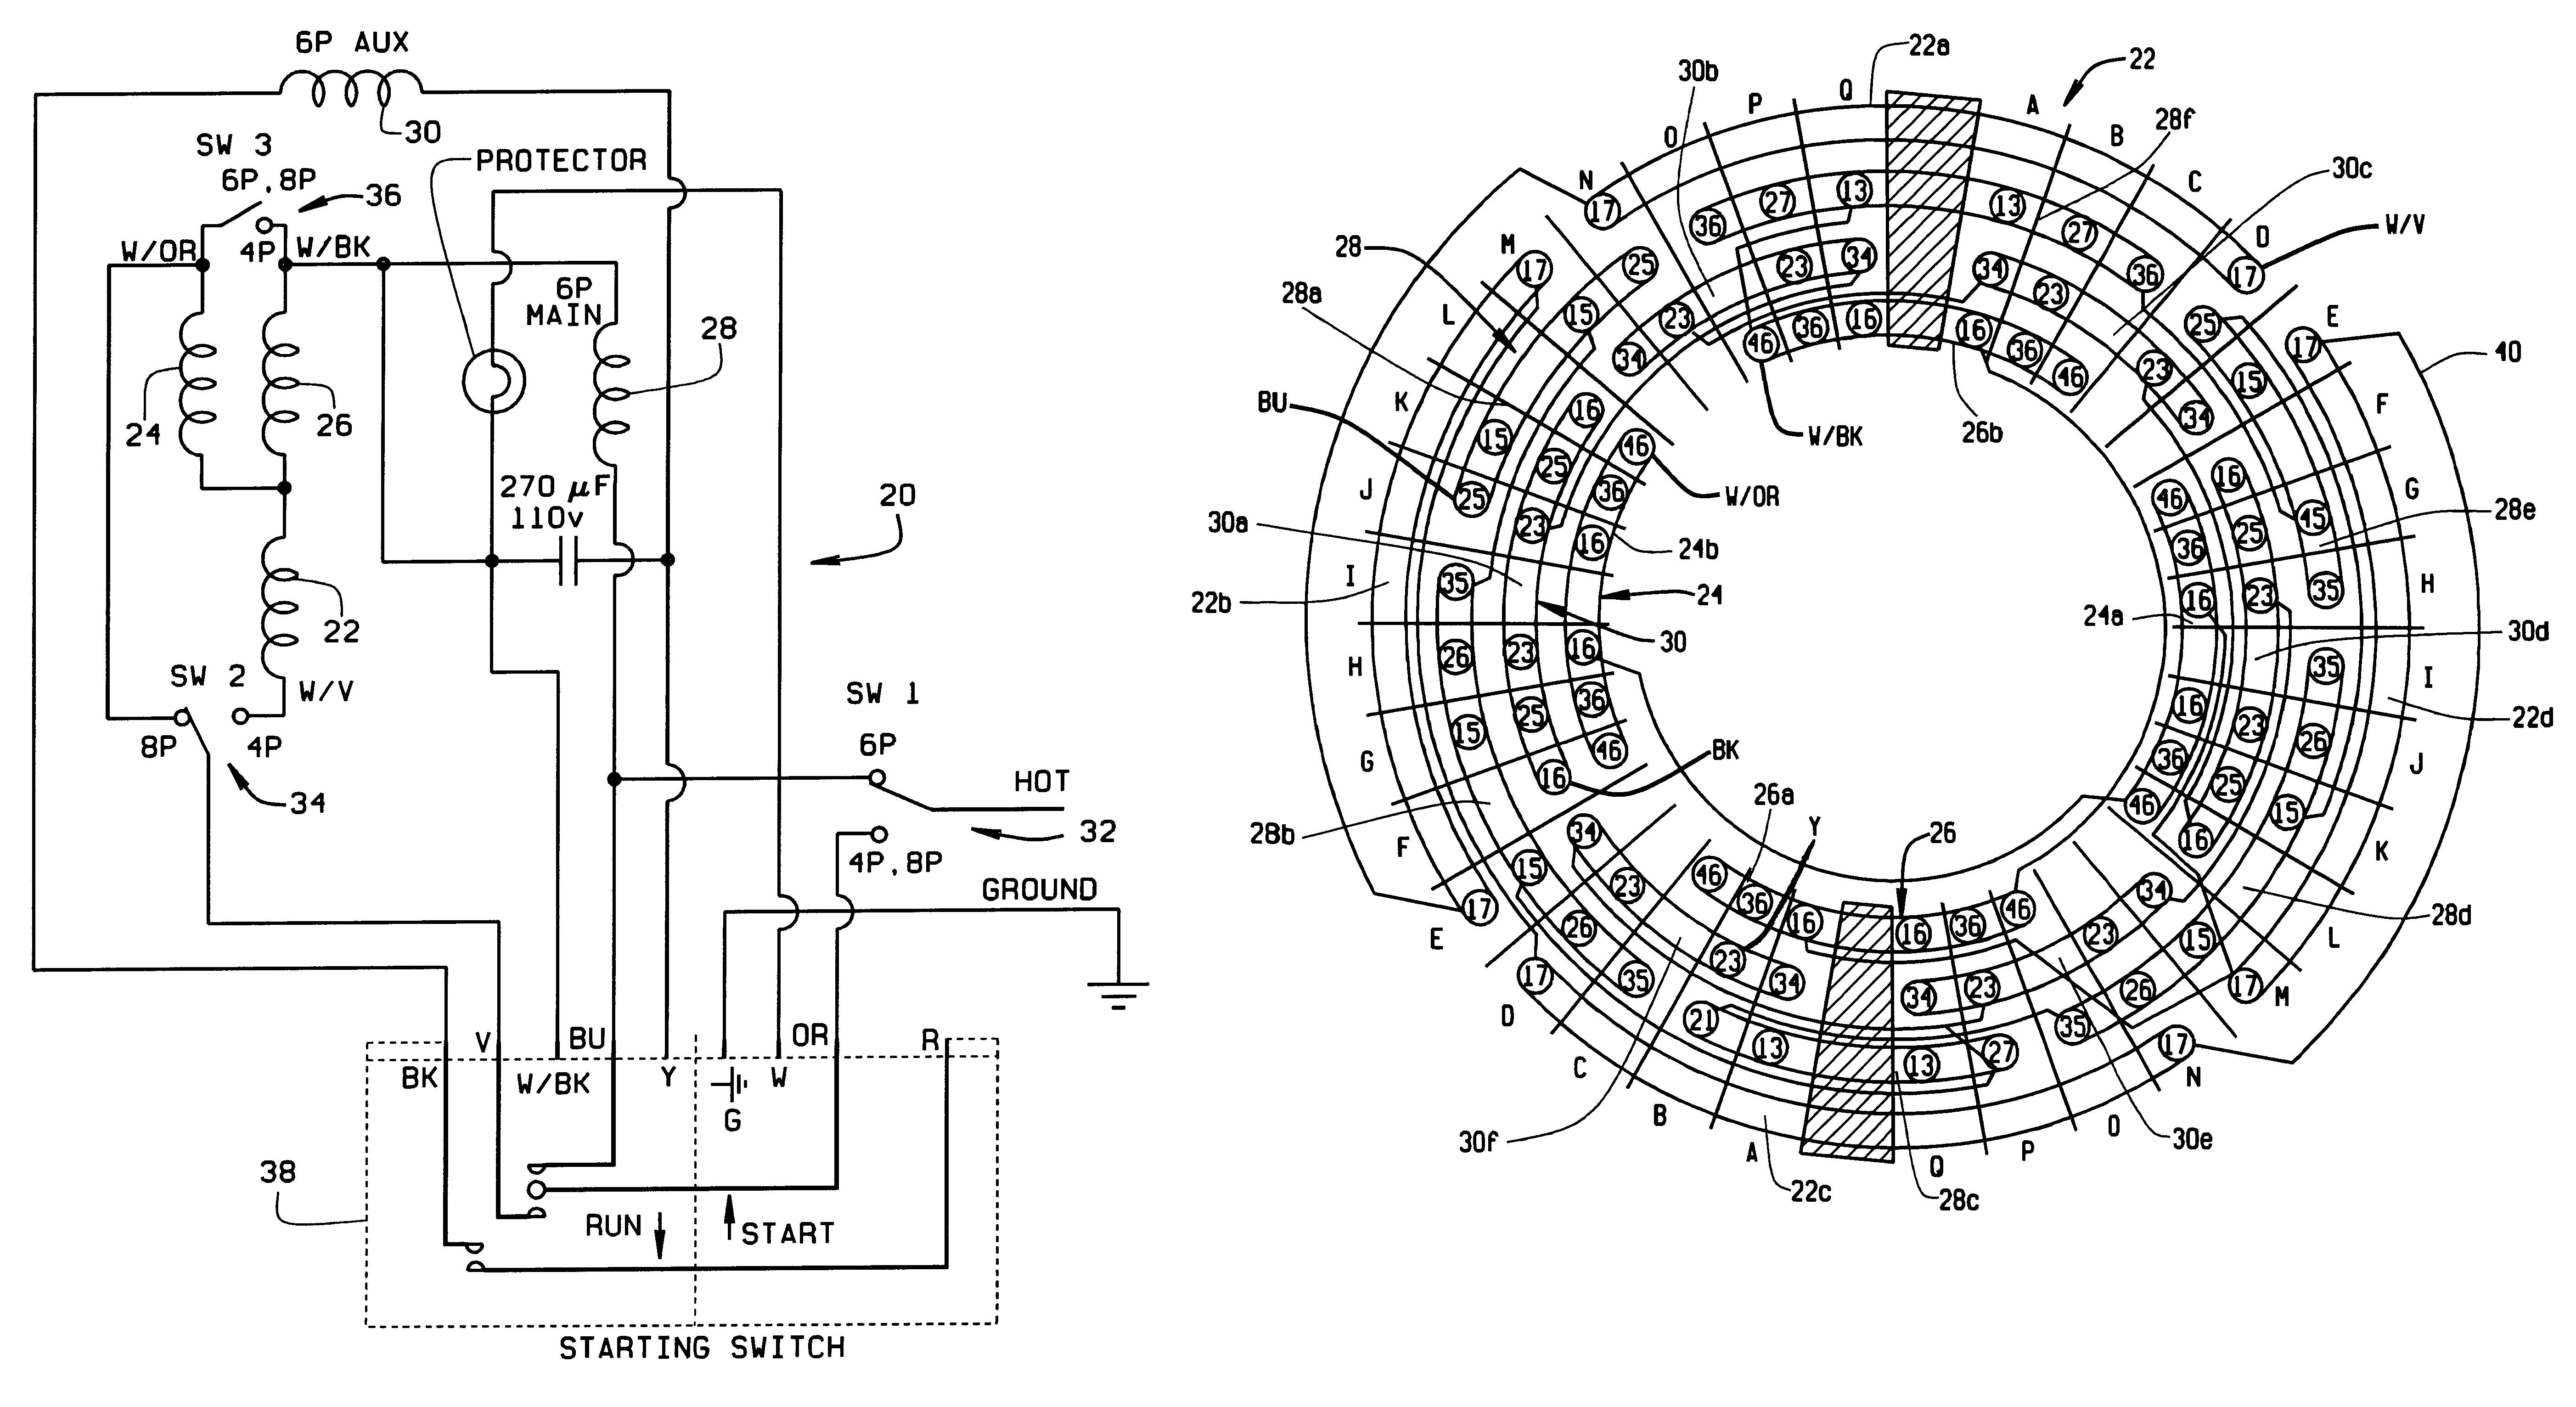 New Wiring Diagram Three Phase Generator  Diagram